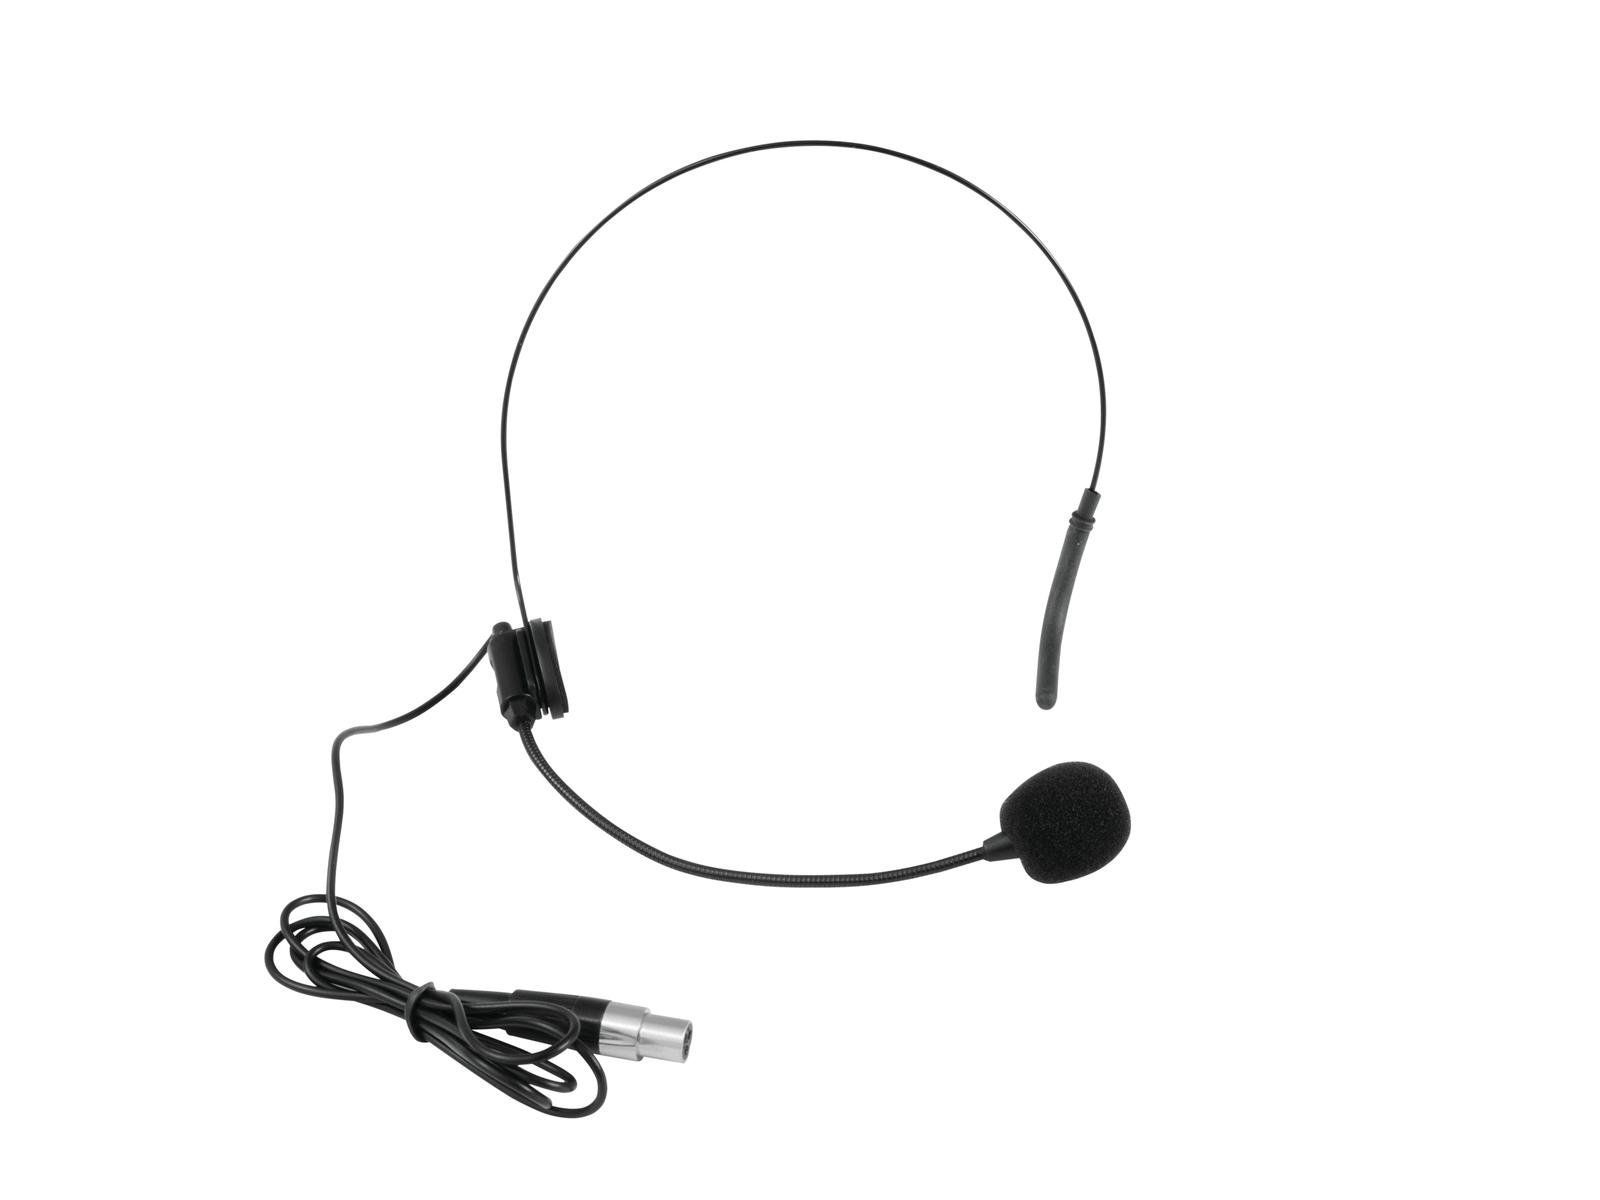 Microfono ad archetto Headset OMNITRONIC UHF-502